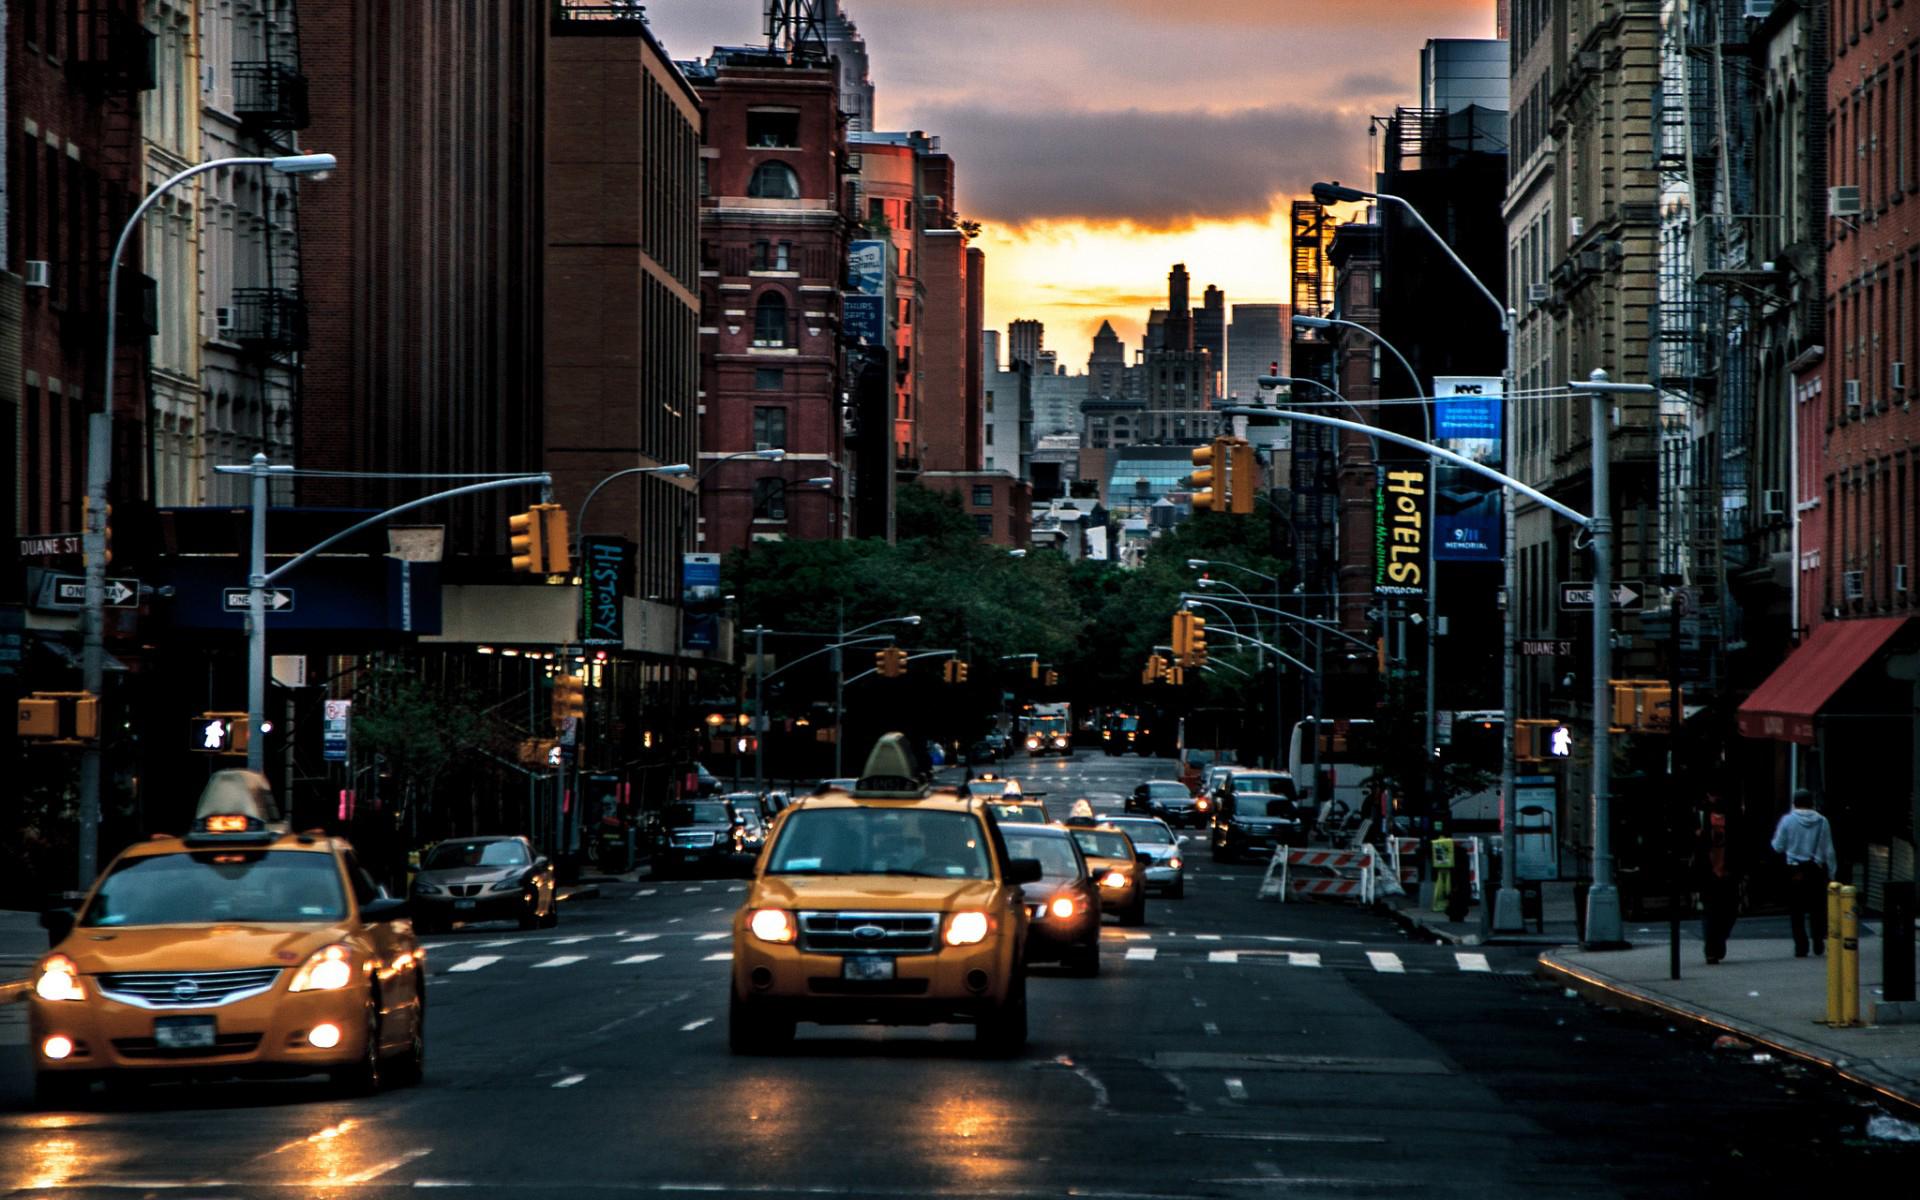 New york hd wallpaper background image 1920x1200 id 523402 wallpaper abyss - New york city wallpaper hd pictures ...